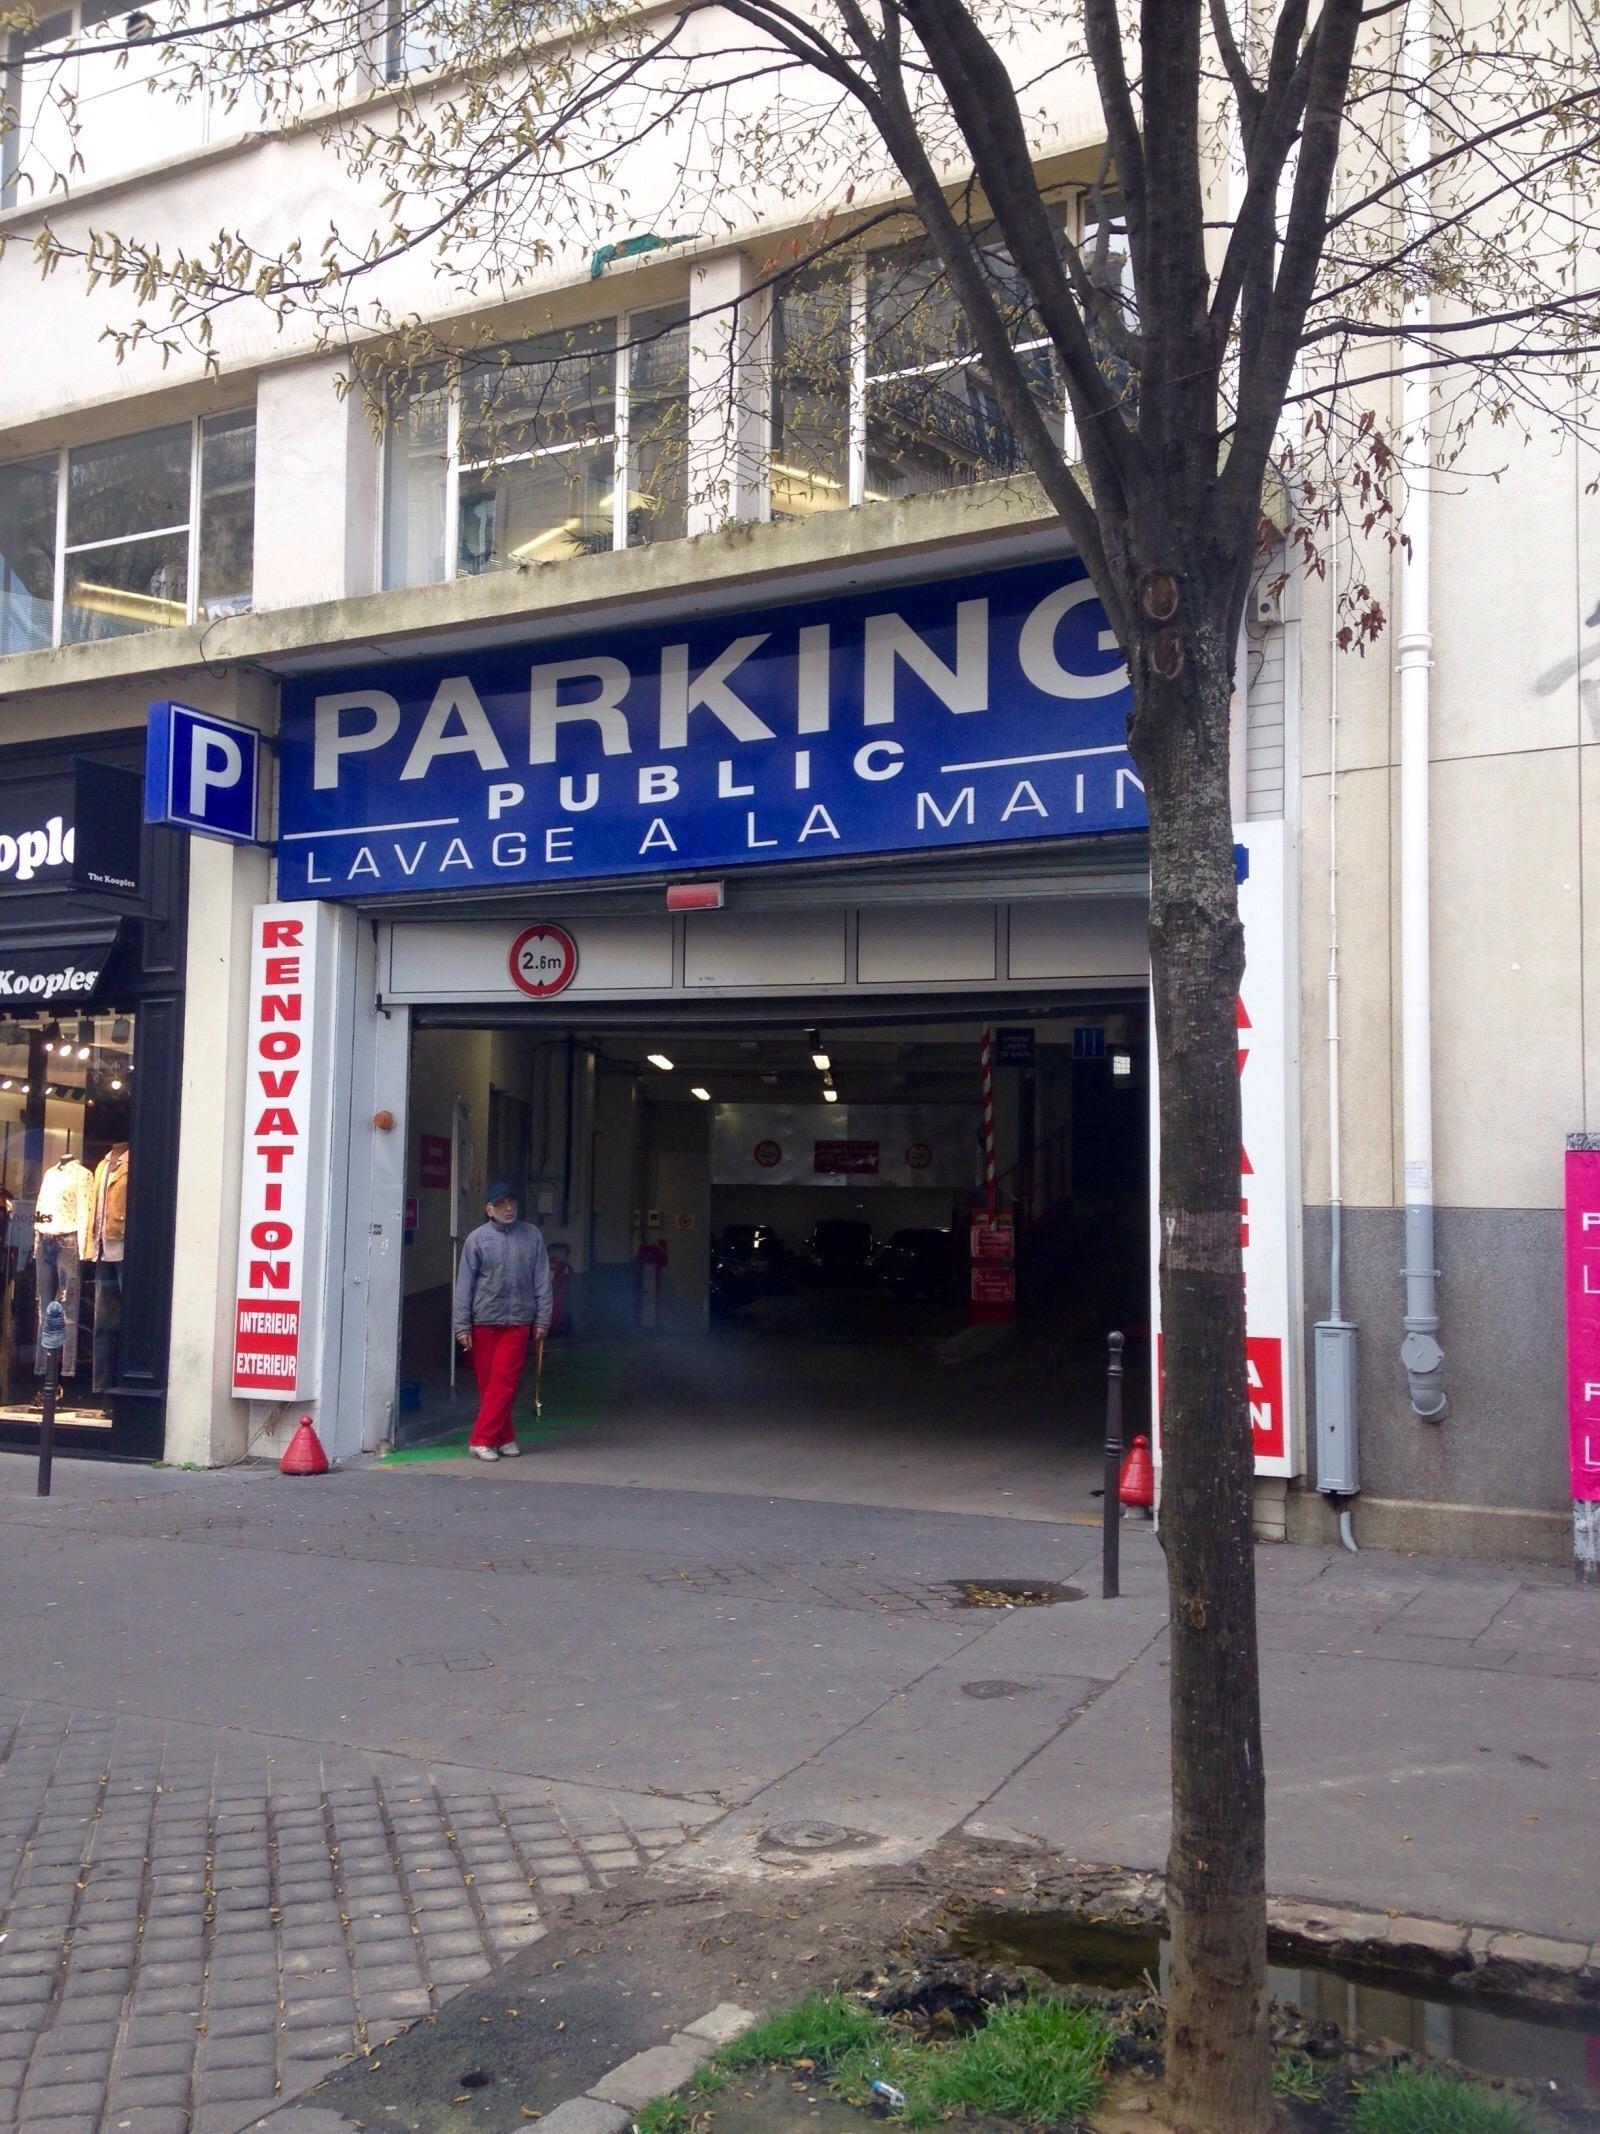 19 rue de passy garage parking in paris parkme. Black Bedroom Furniture Sets. Home Design Ideas